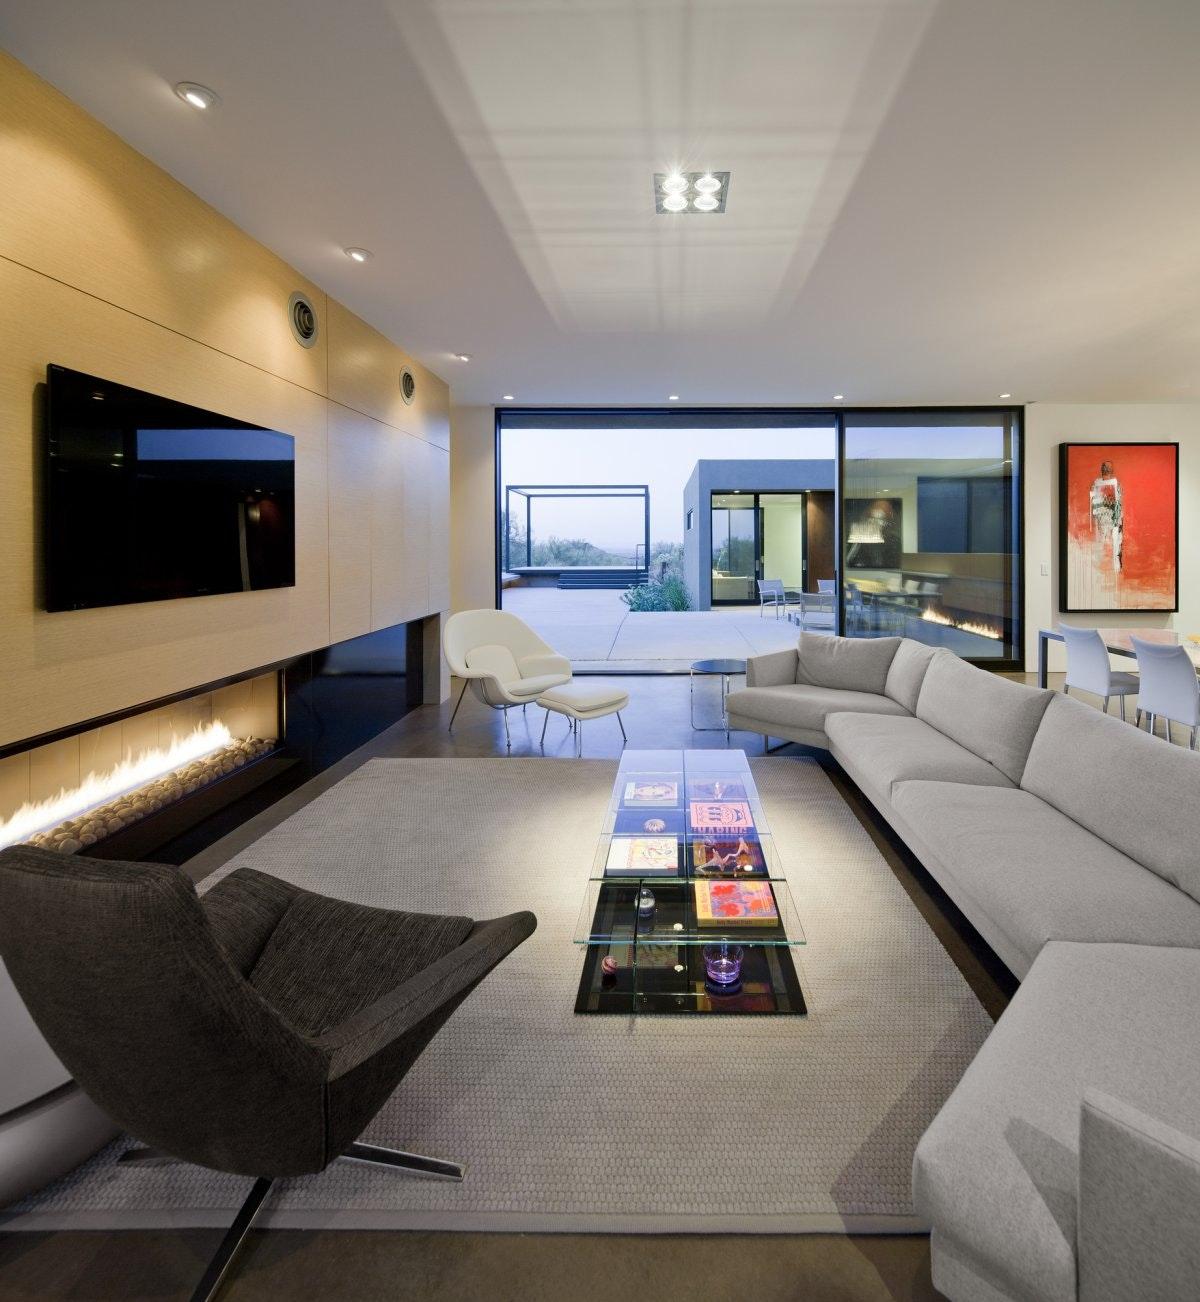 Desert House Residence By Circle West Architects, Paradise Valley, Arizona.  Levin Residence By Ibarra Rosano Design Architects, Marana, Arizona